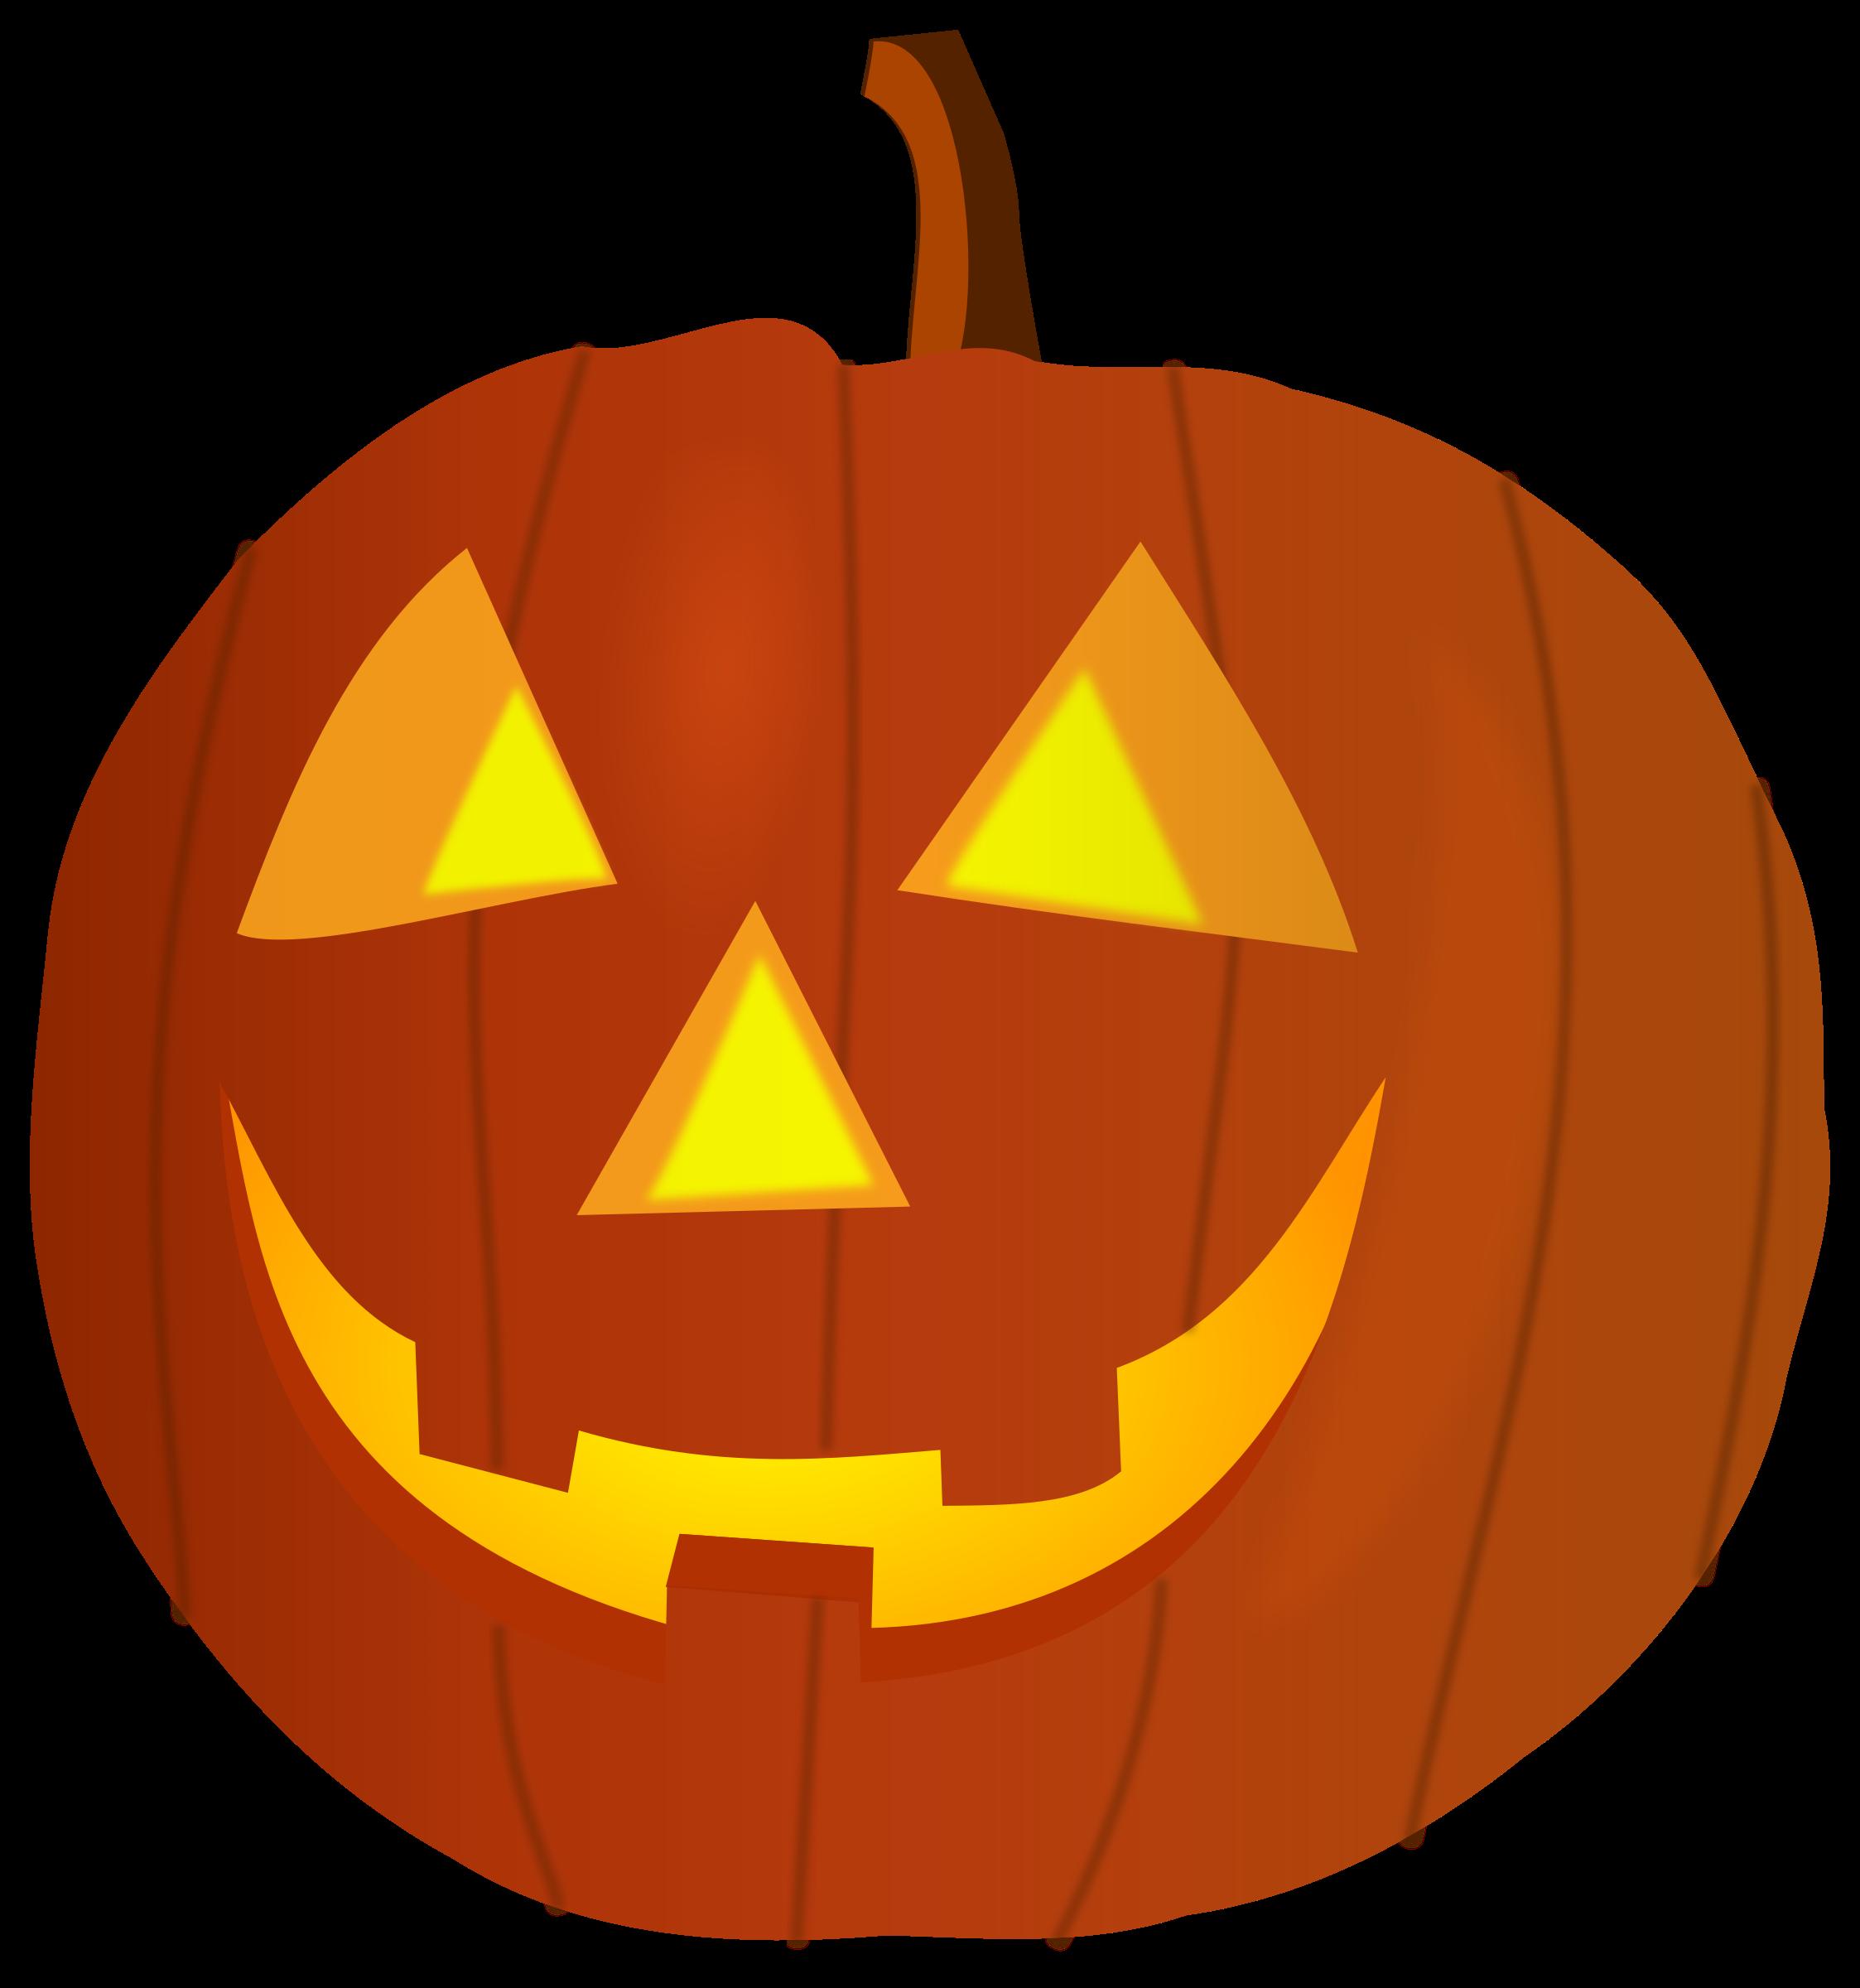 Citrouille big image png. Clipart pumpkin pumpkin decorating